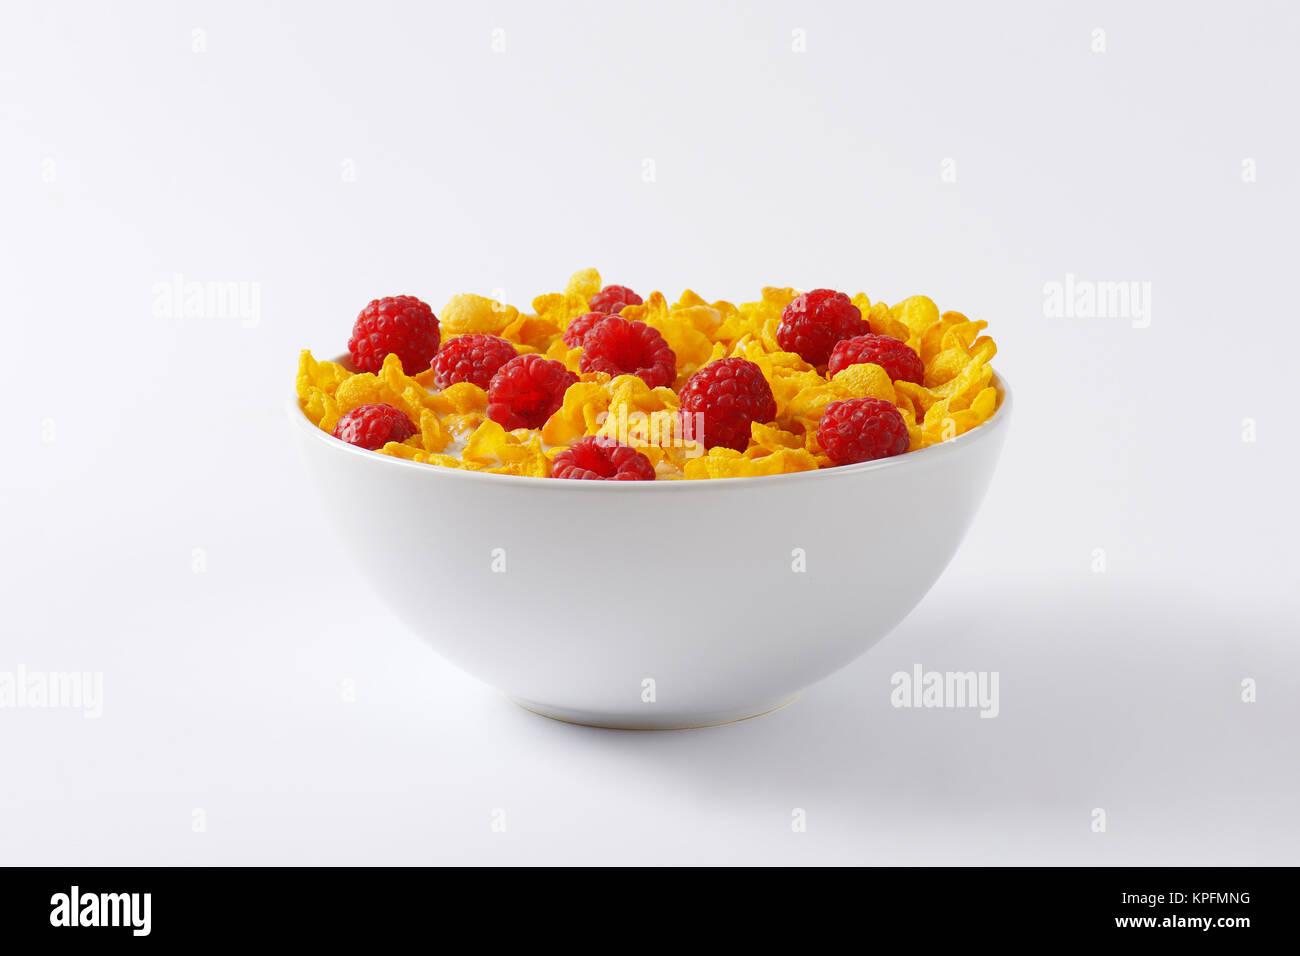 cornflakes and raspberries - Stock Image